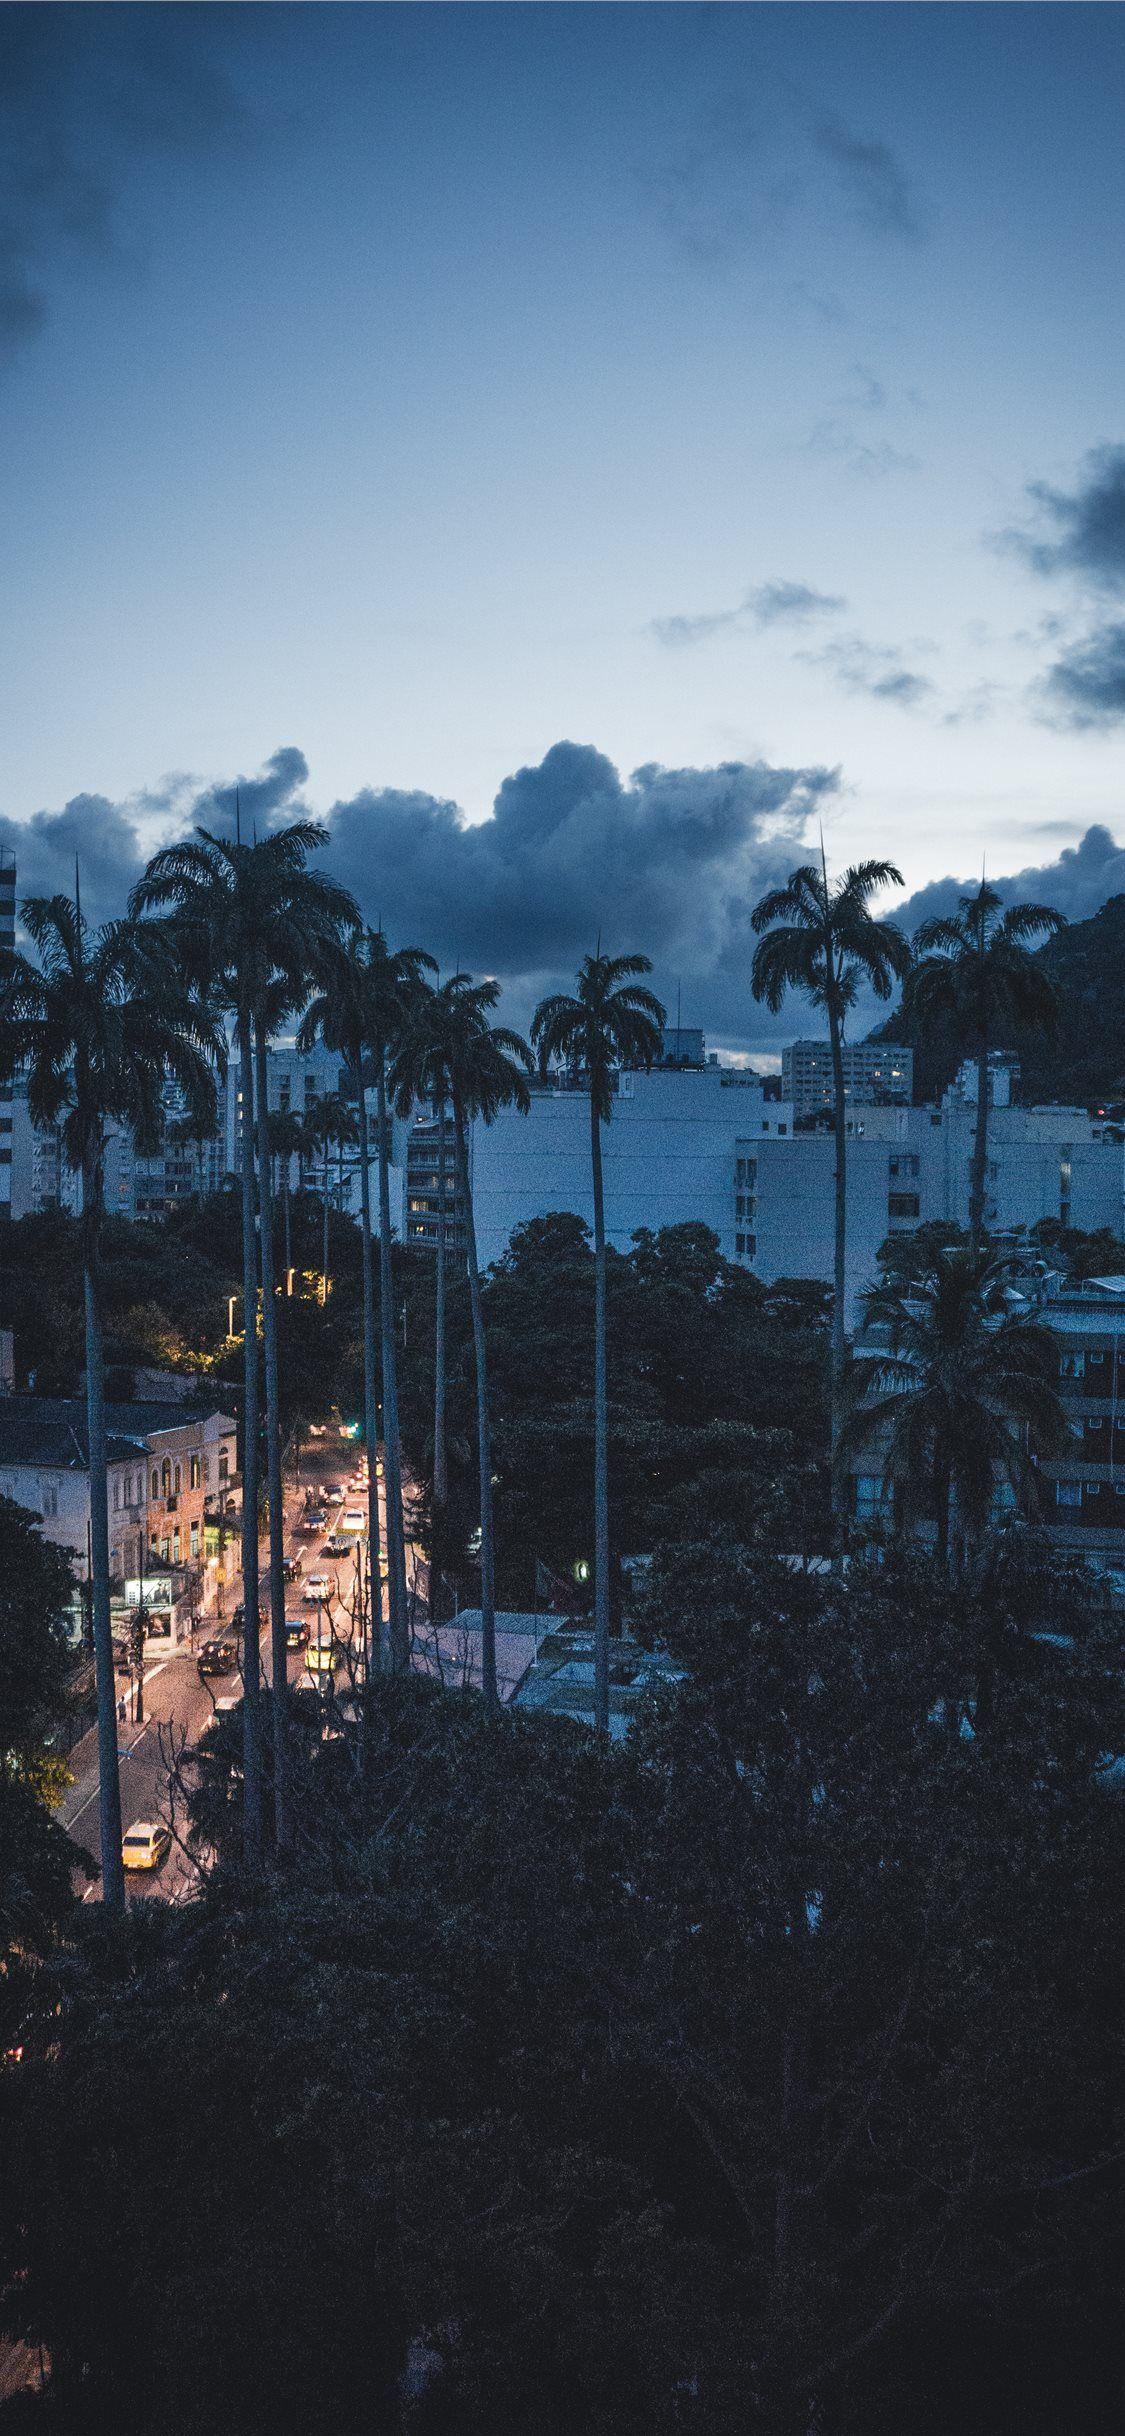 Sunset In Rio Stateofriodejaneiro Brazil Palmtree Unsplash Androidwallpaper Andr Sunset Iphone Wallpaper Iphone Wallpaper Unsplash Best Iphone Wallpapers